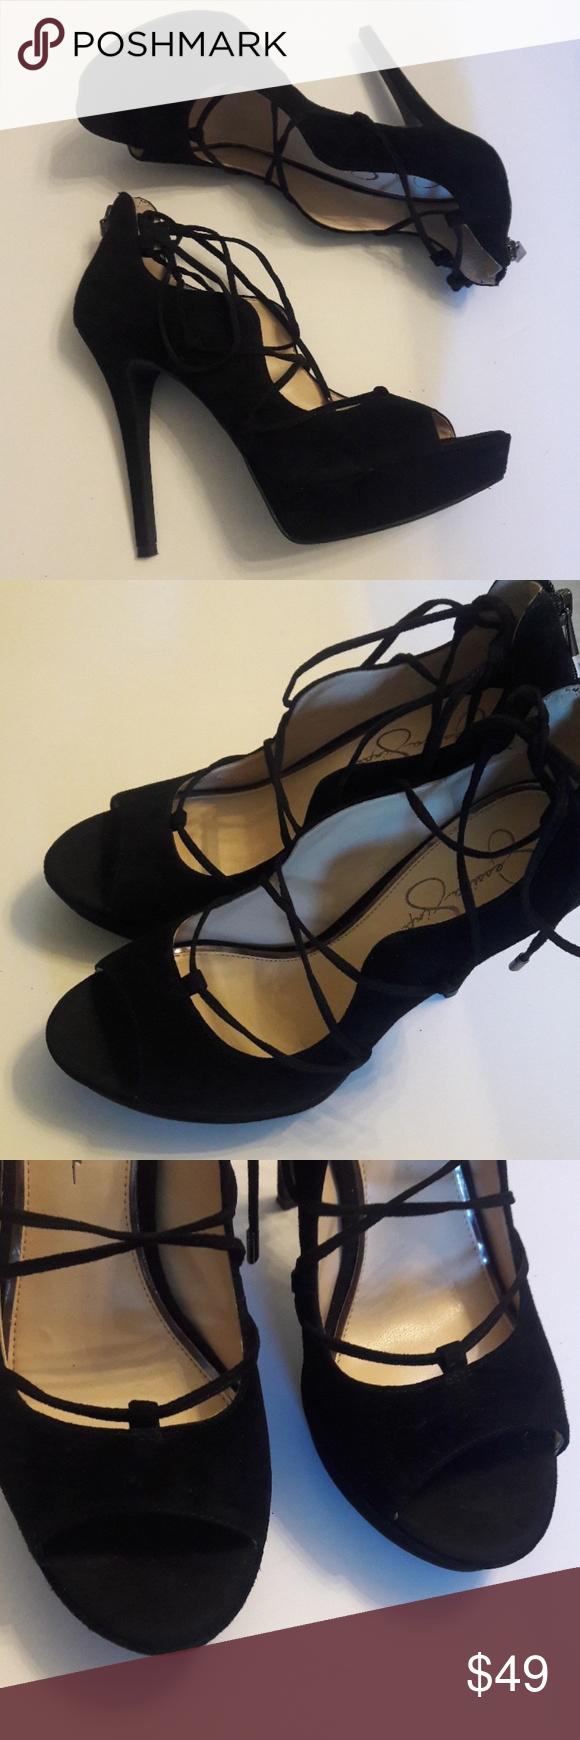 Jessica Simpson/ Black/ Lace Up/ Heels